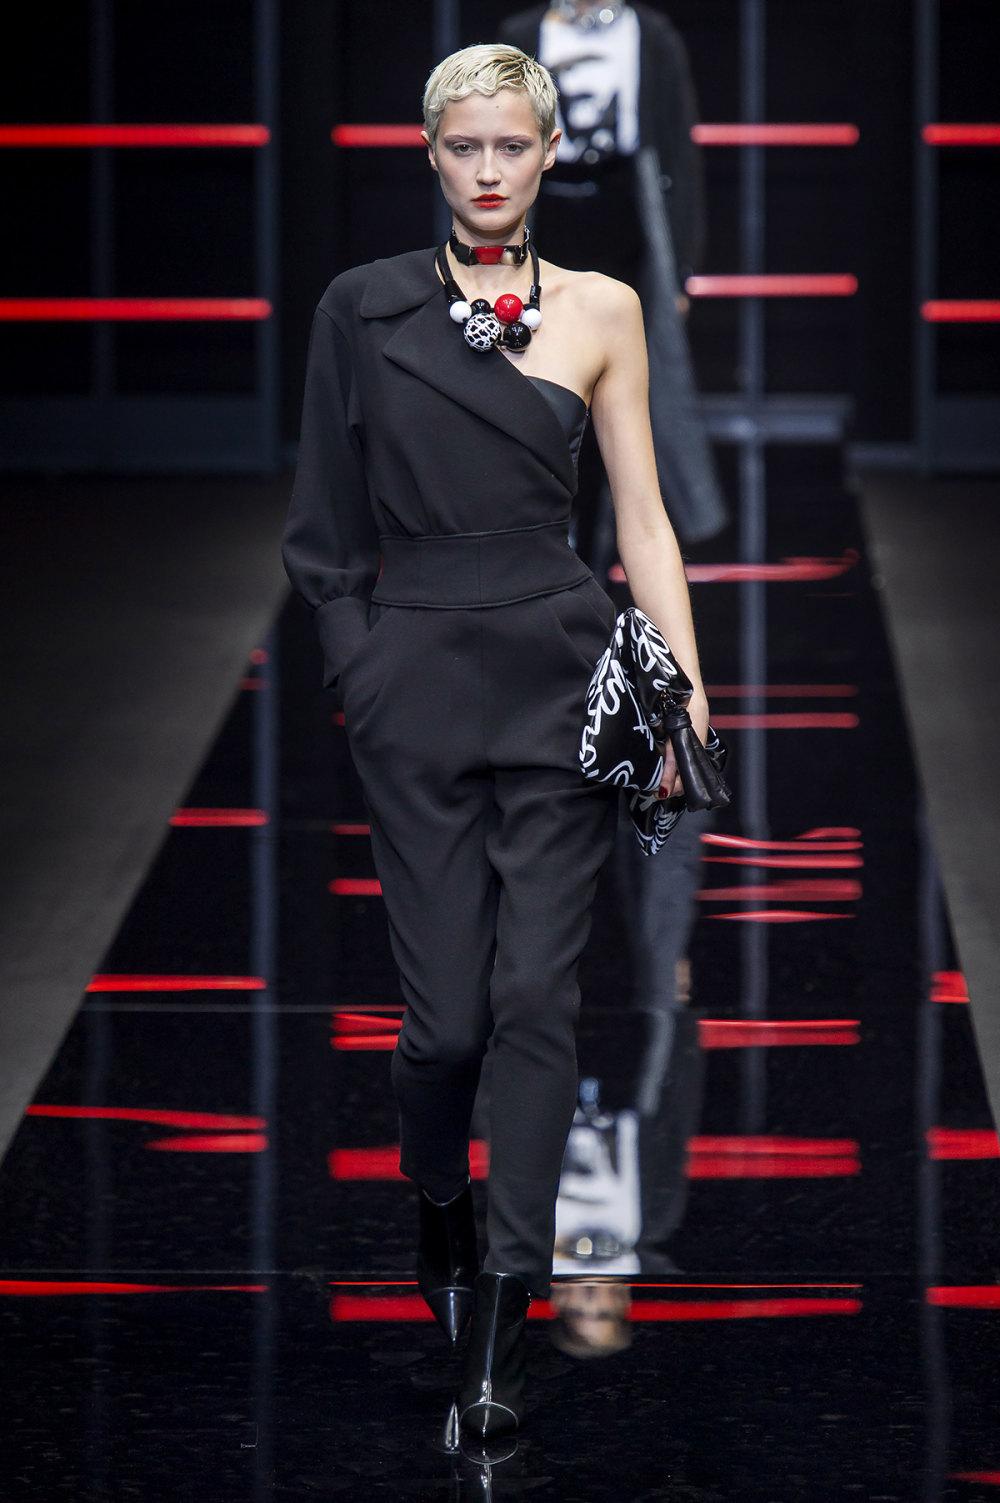 Emporio Armani时装系列畅的裤子带有柔滑裙子的鸡尾酒礼服-24.jpg